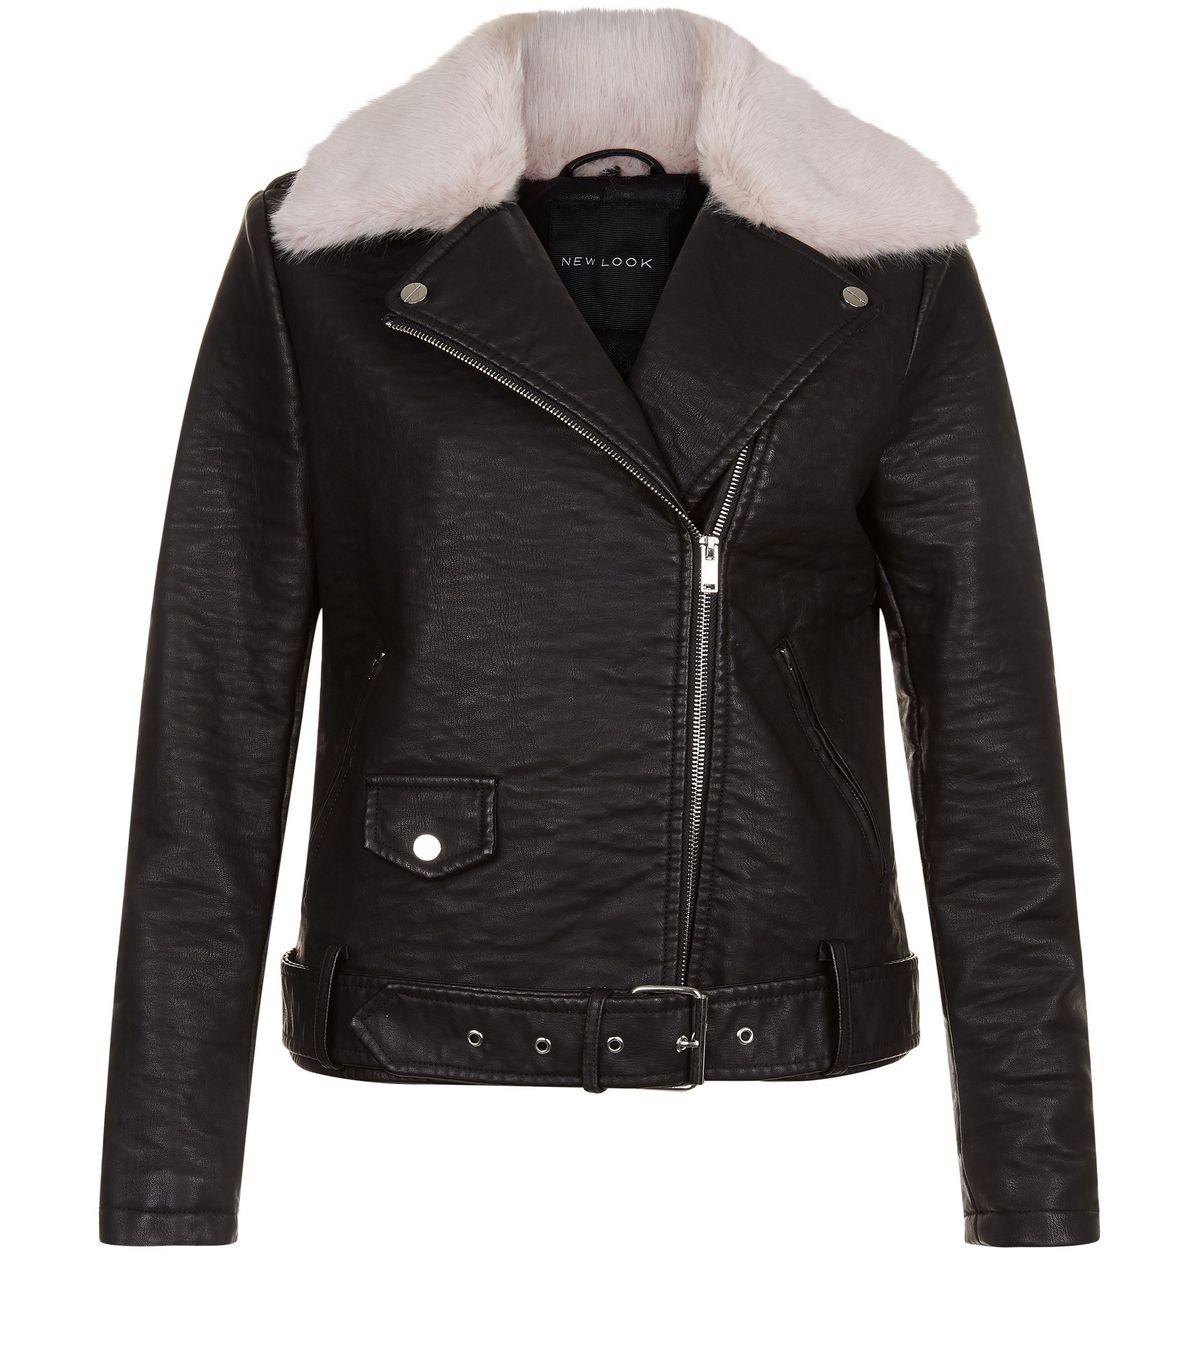 Black_Leather_Look_Faux_Fur_Trim_Biker_Jacket (3)